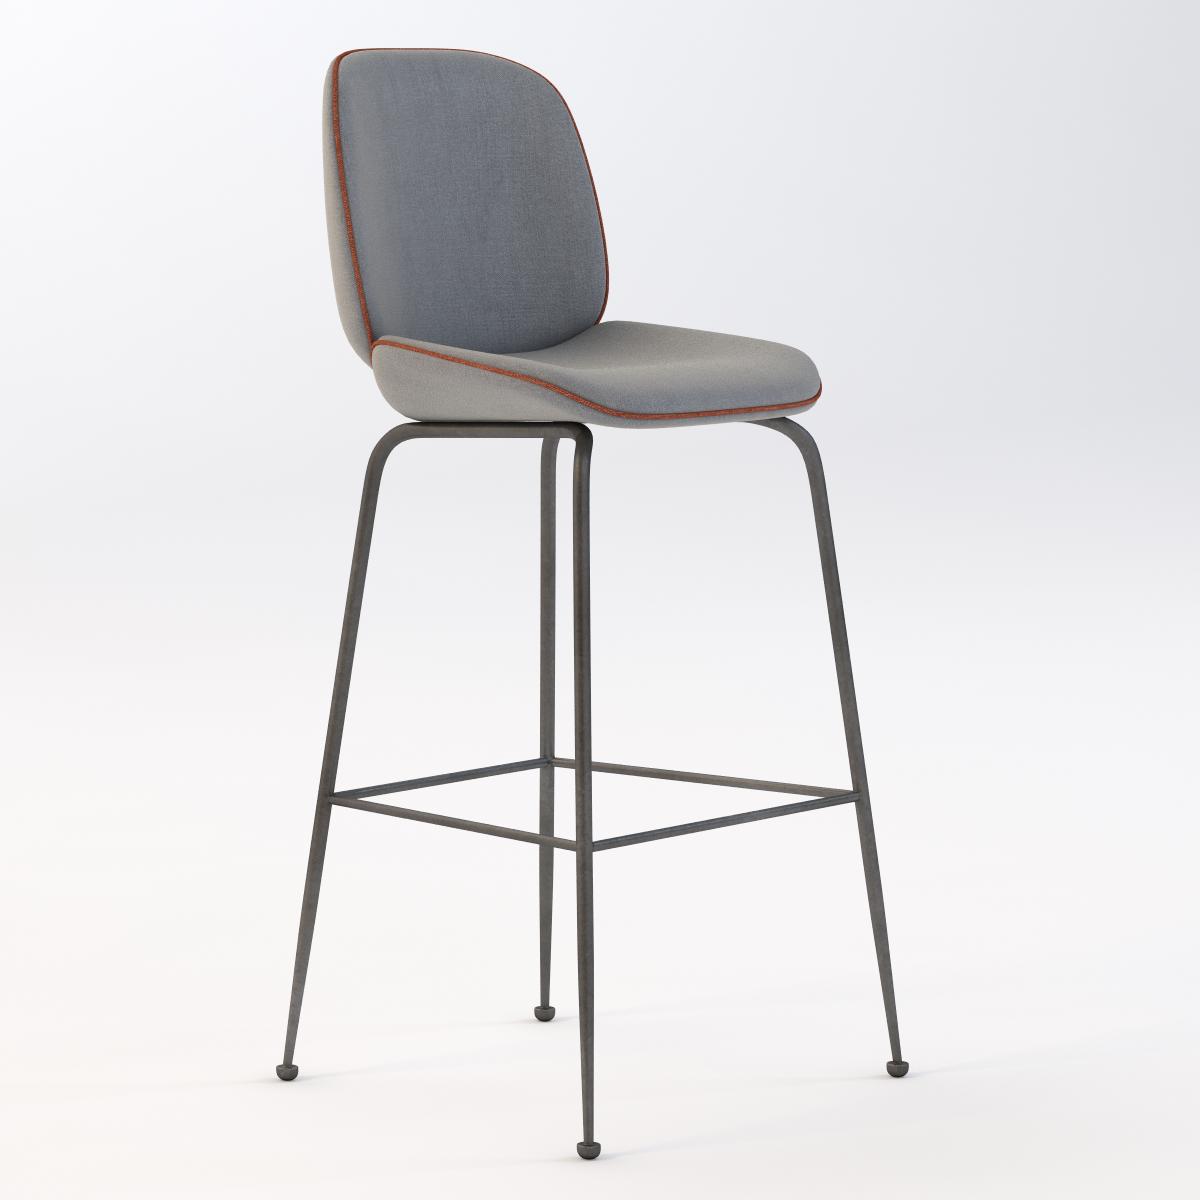 Swell Gubi Beetle Stool Machost Co Dining Chair Design Ideas Machostcouk